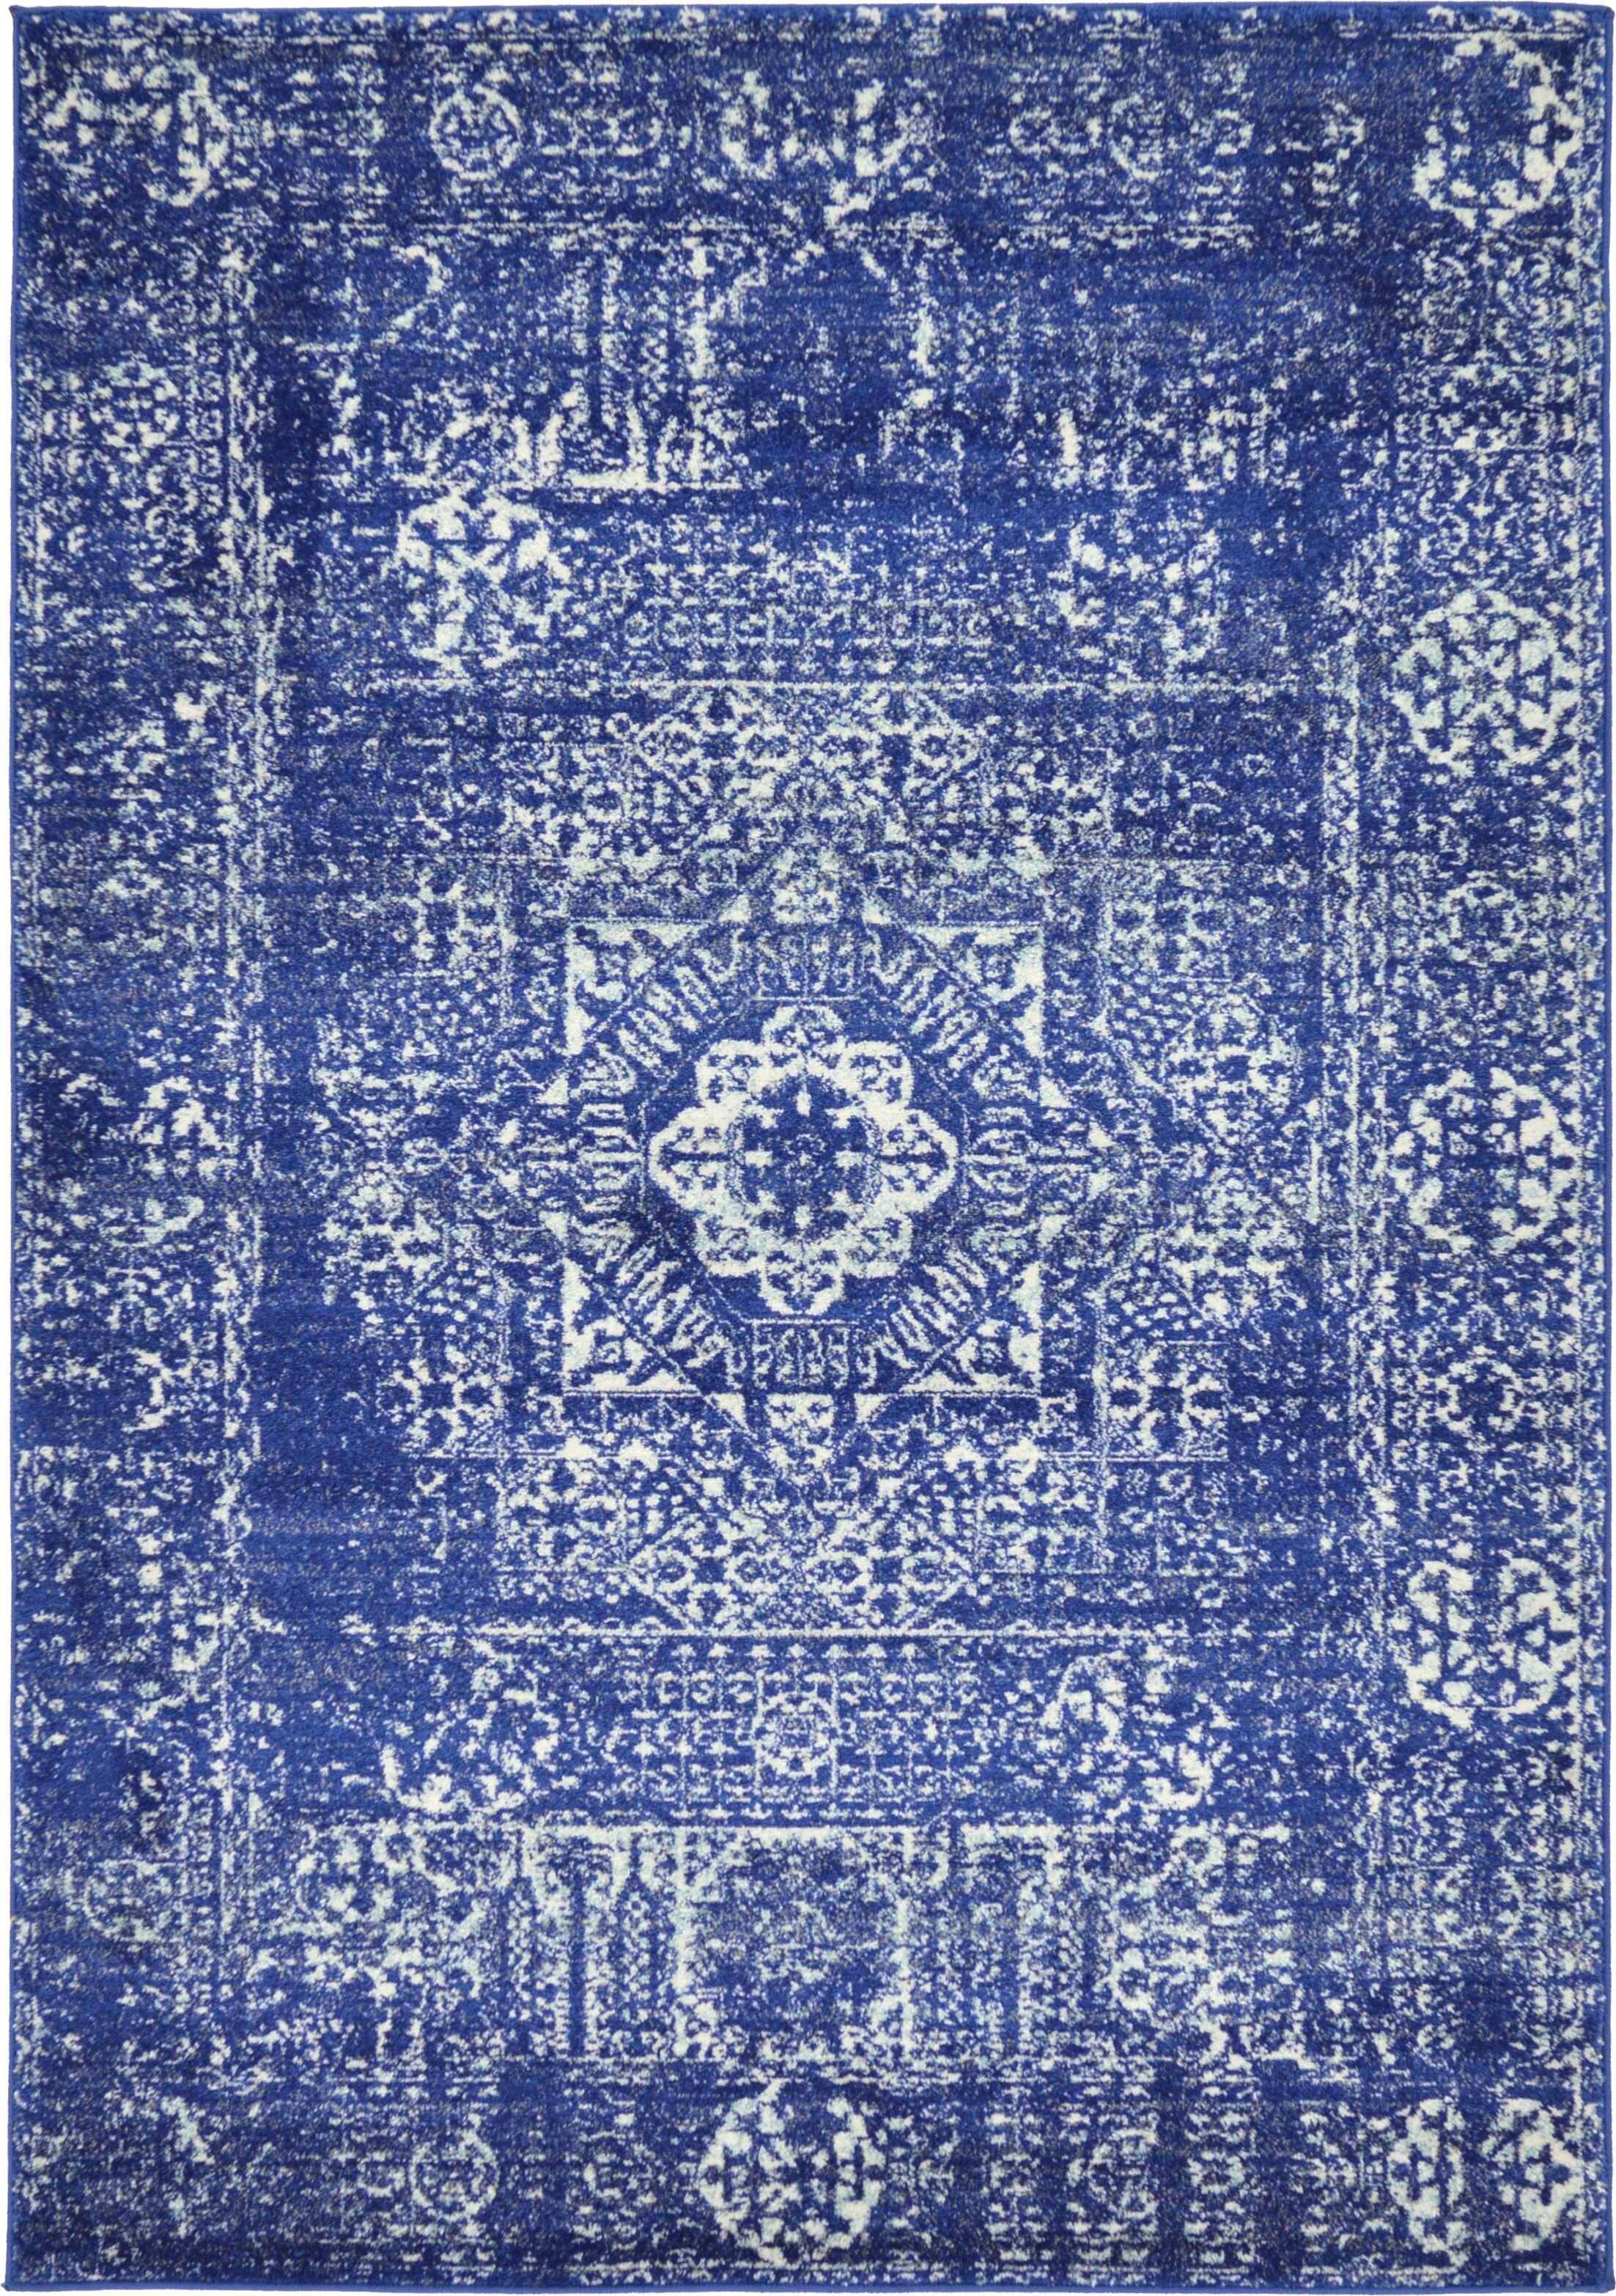 Ove Blue Area Rug Rug Size: Rectangle 4' x 6'